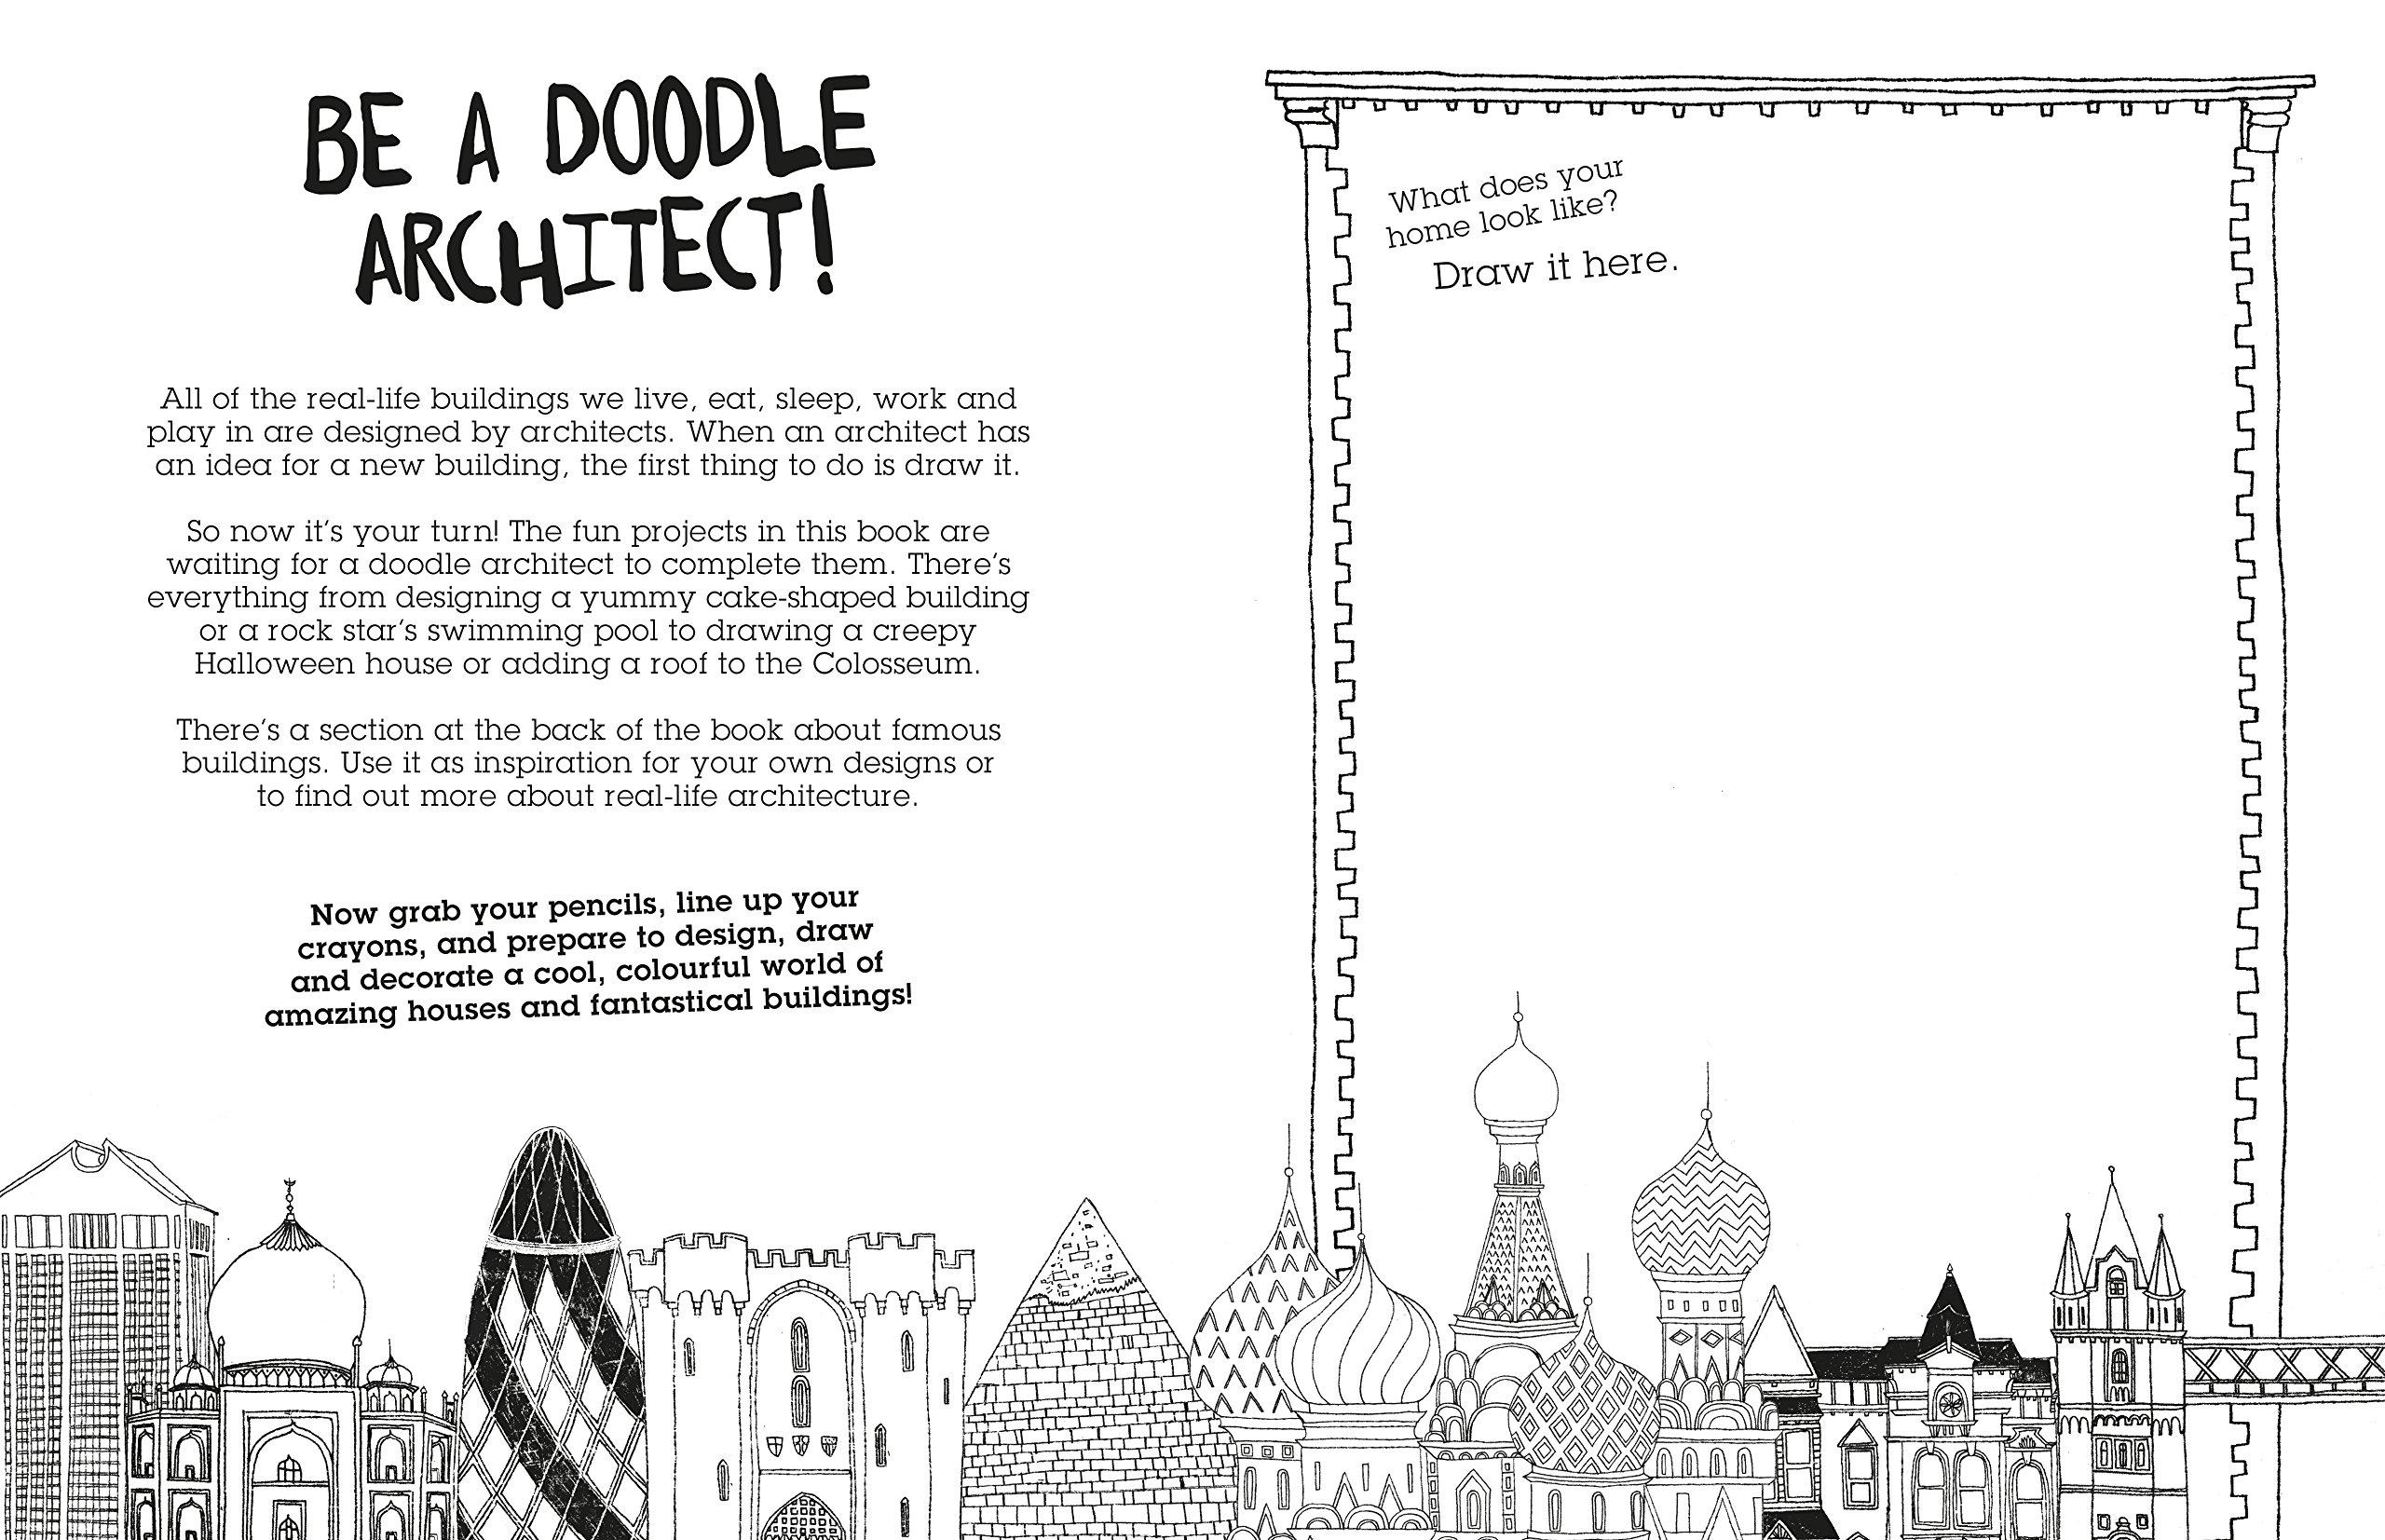 make buildings a doodle design activity book charlotte farmer make buildings a doodle design activity book charlotte farmer 9781782403272 amazon com books